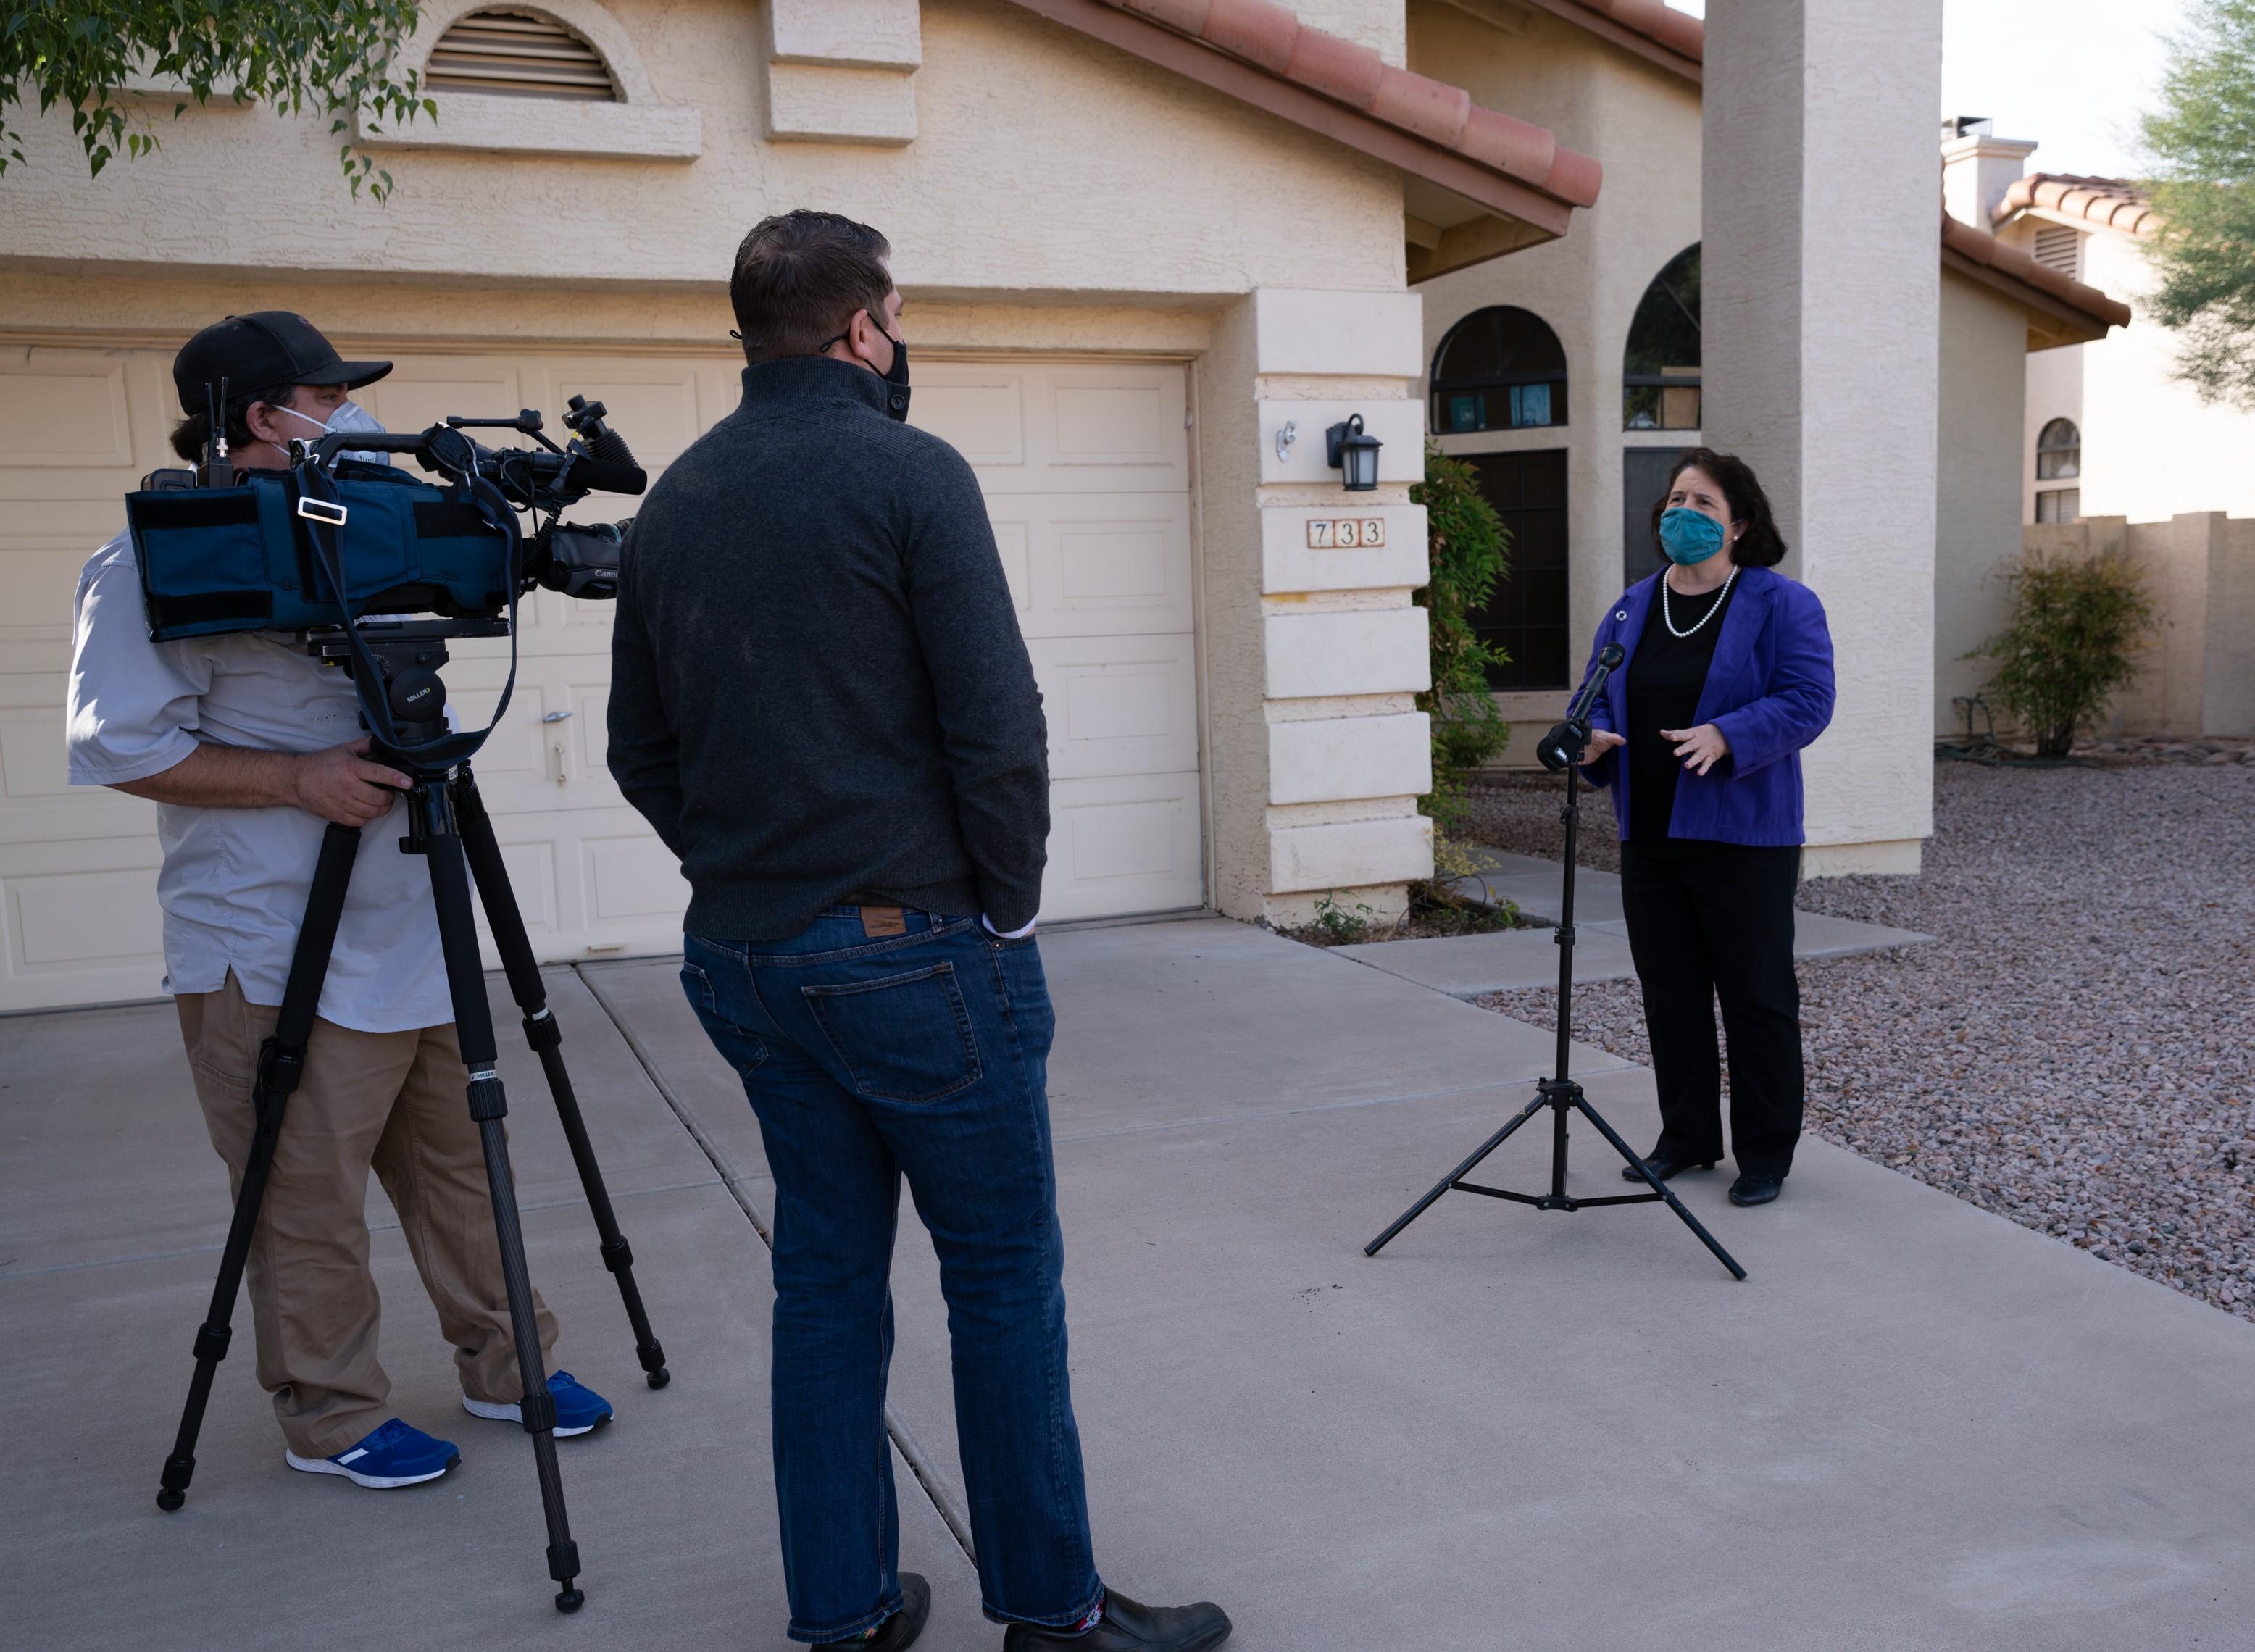 ME_Fox10_Interview_on_driveway.jpg